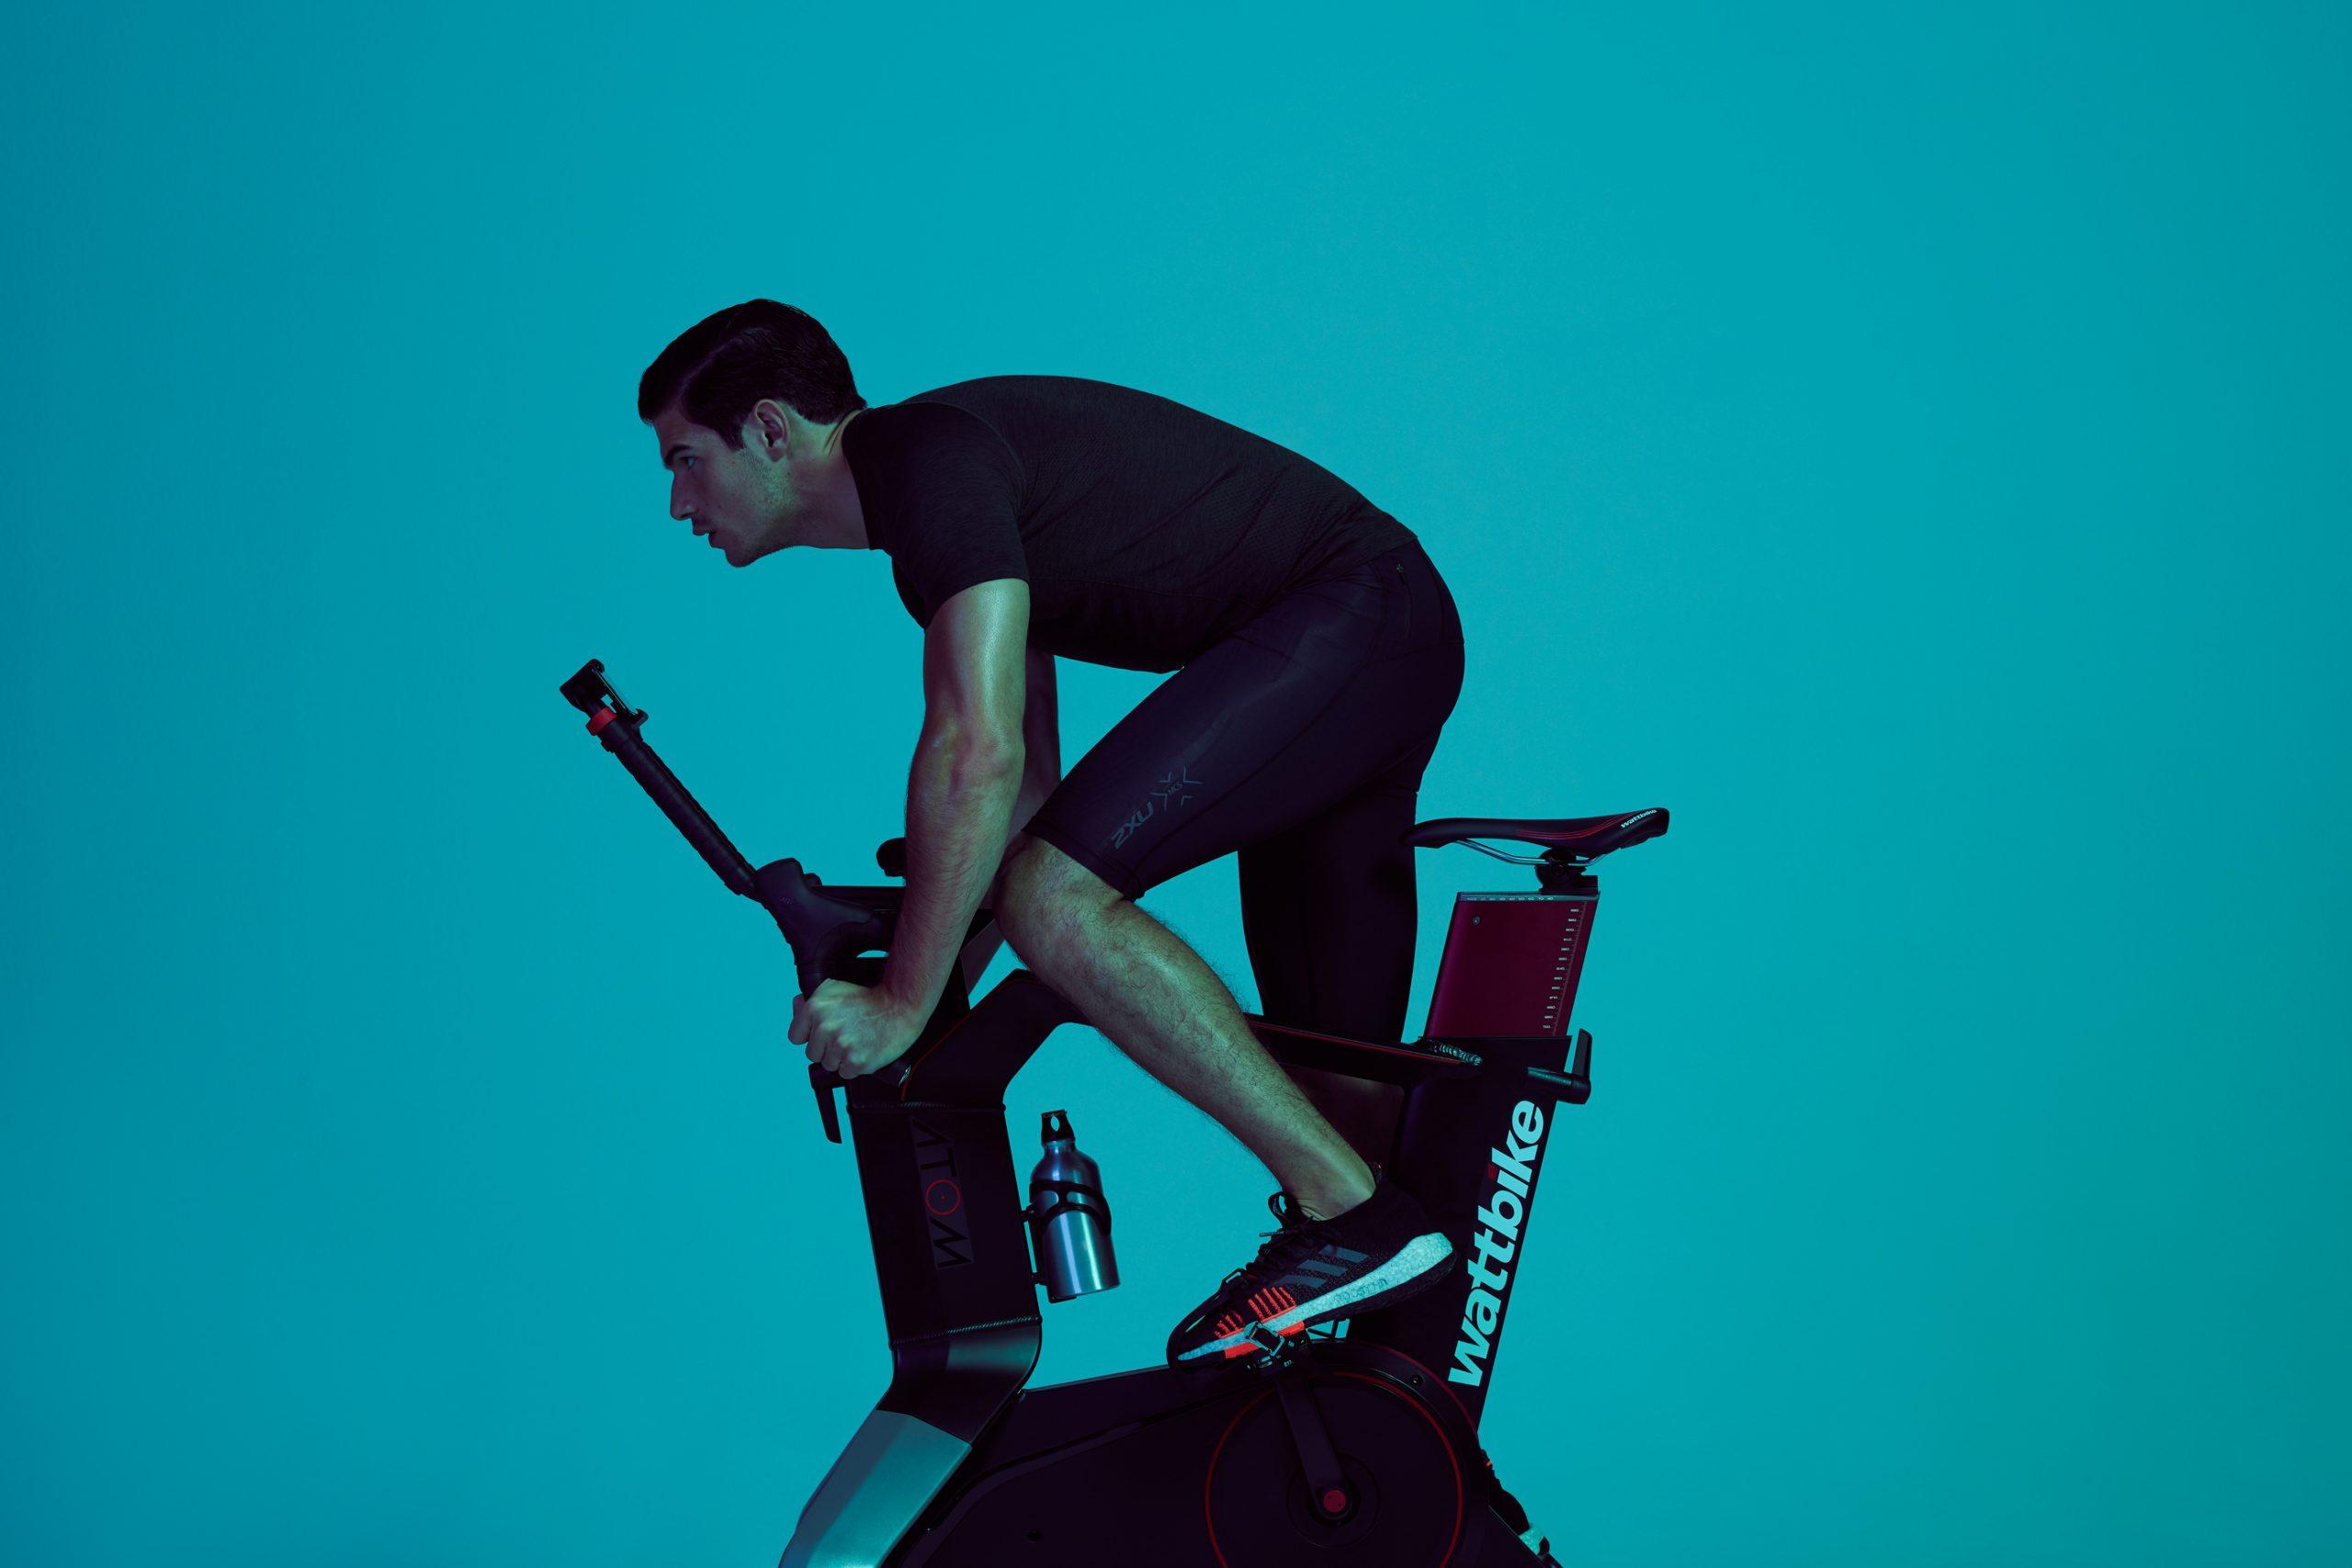 MH-Gym-Feature_Shot-02_Wattbike-Training_73680